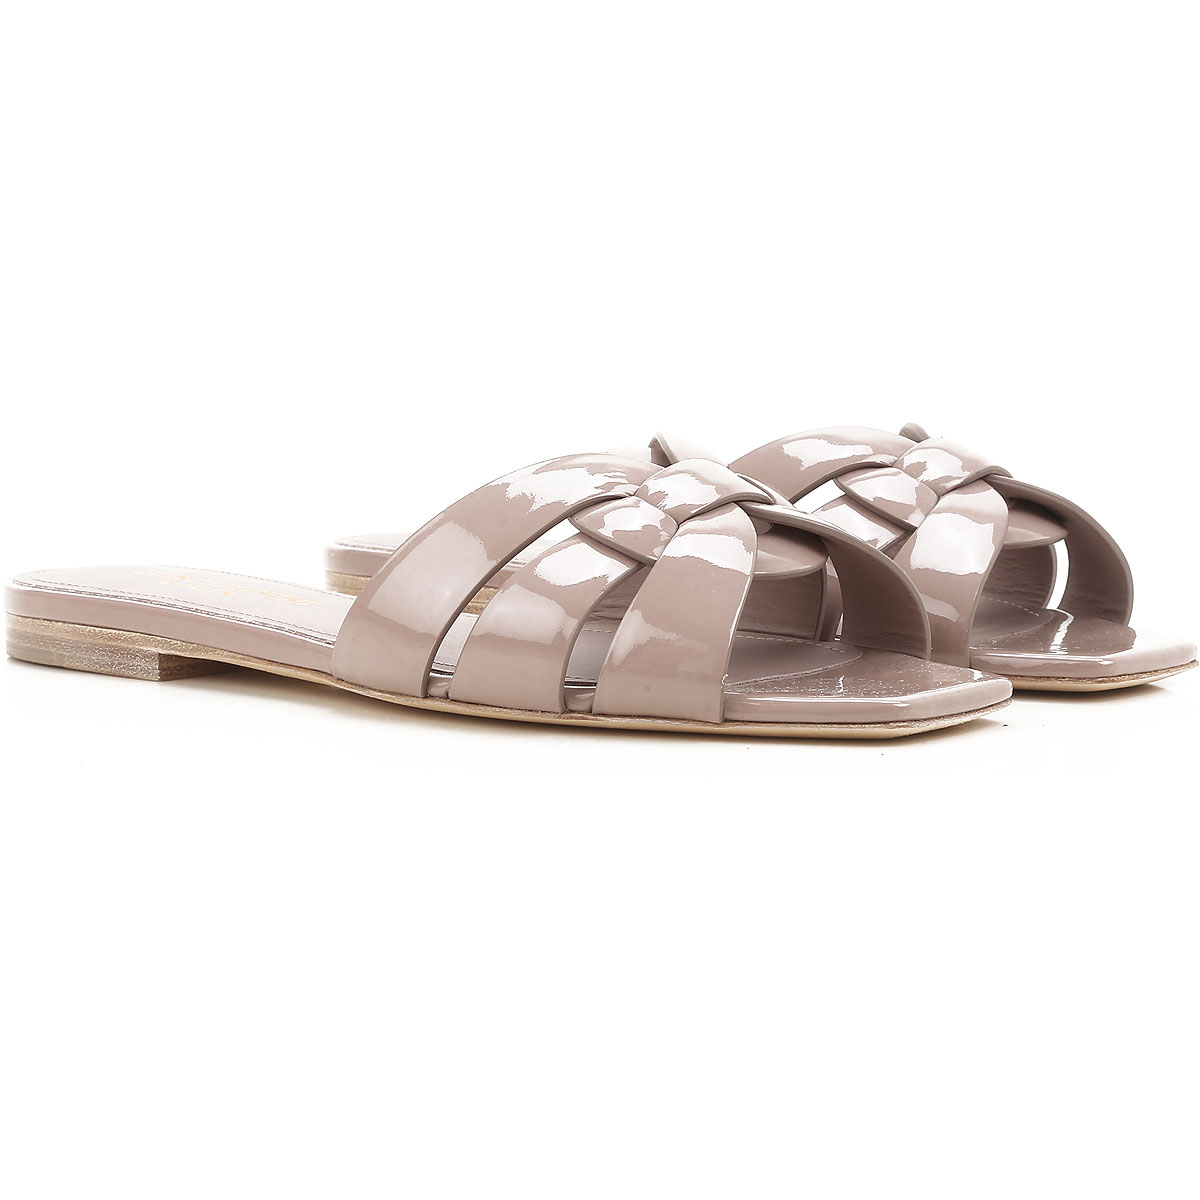 chaussures femme yves saint laurent code produit 472064 b8i00 6843. Black Bedroom Furniture Sets. Home Design Ideas